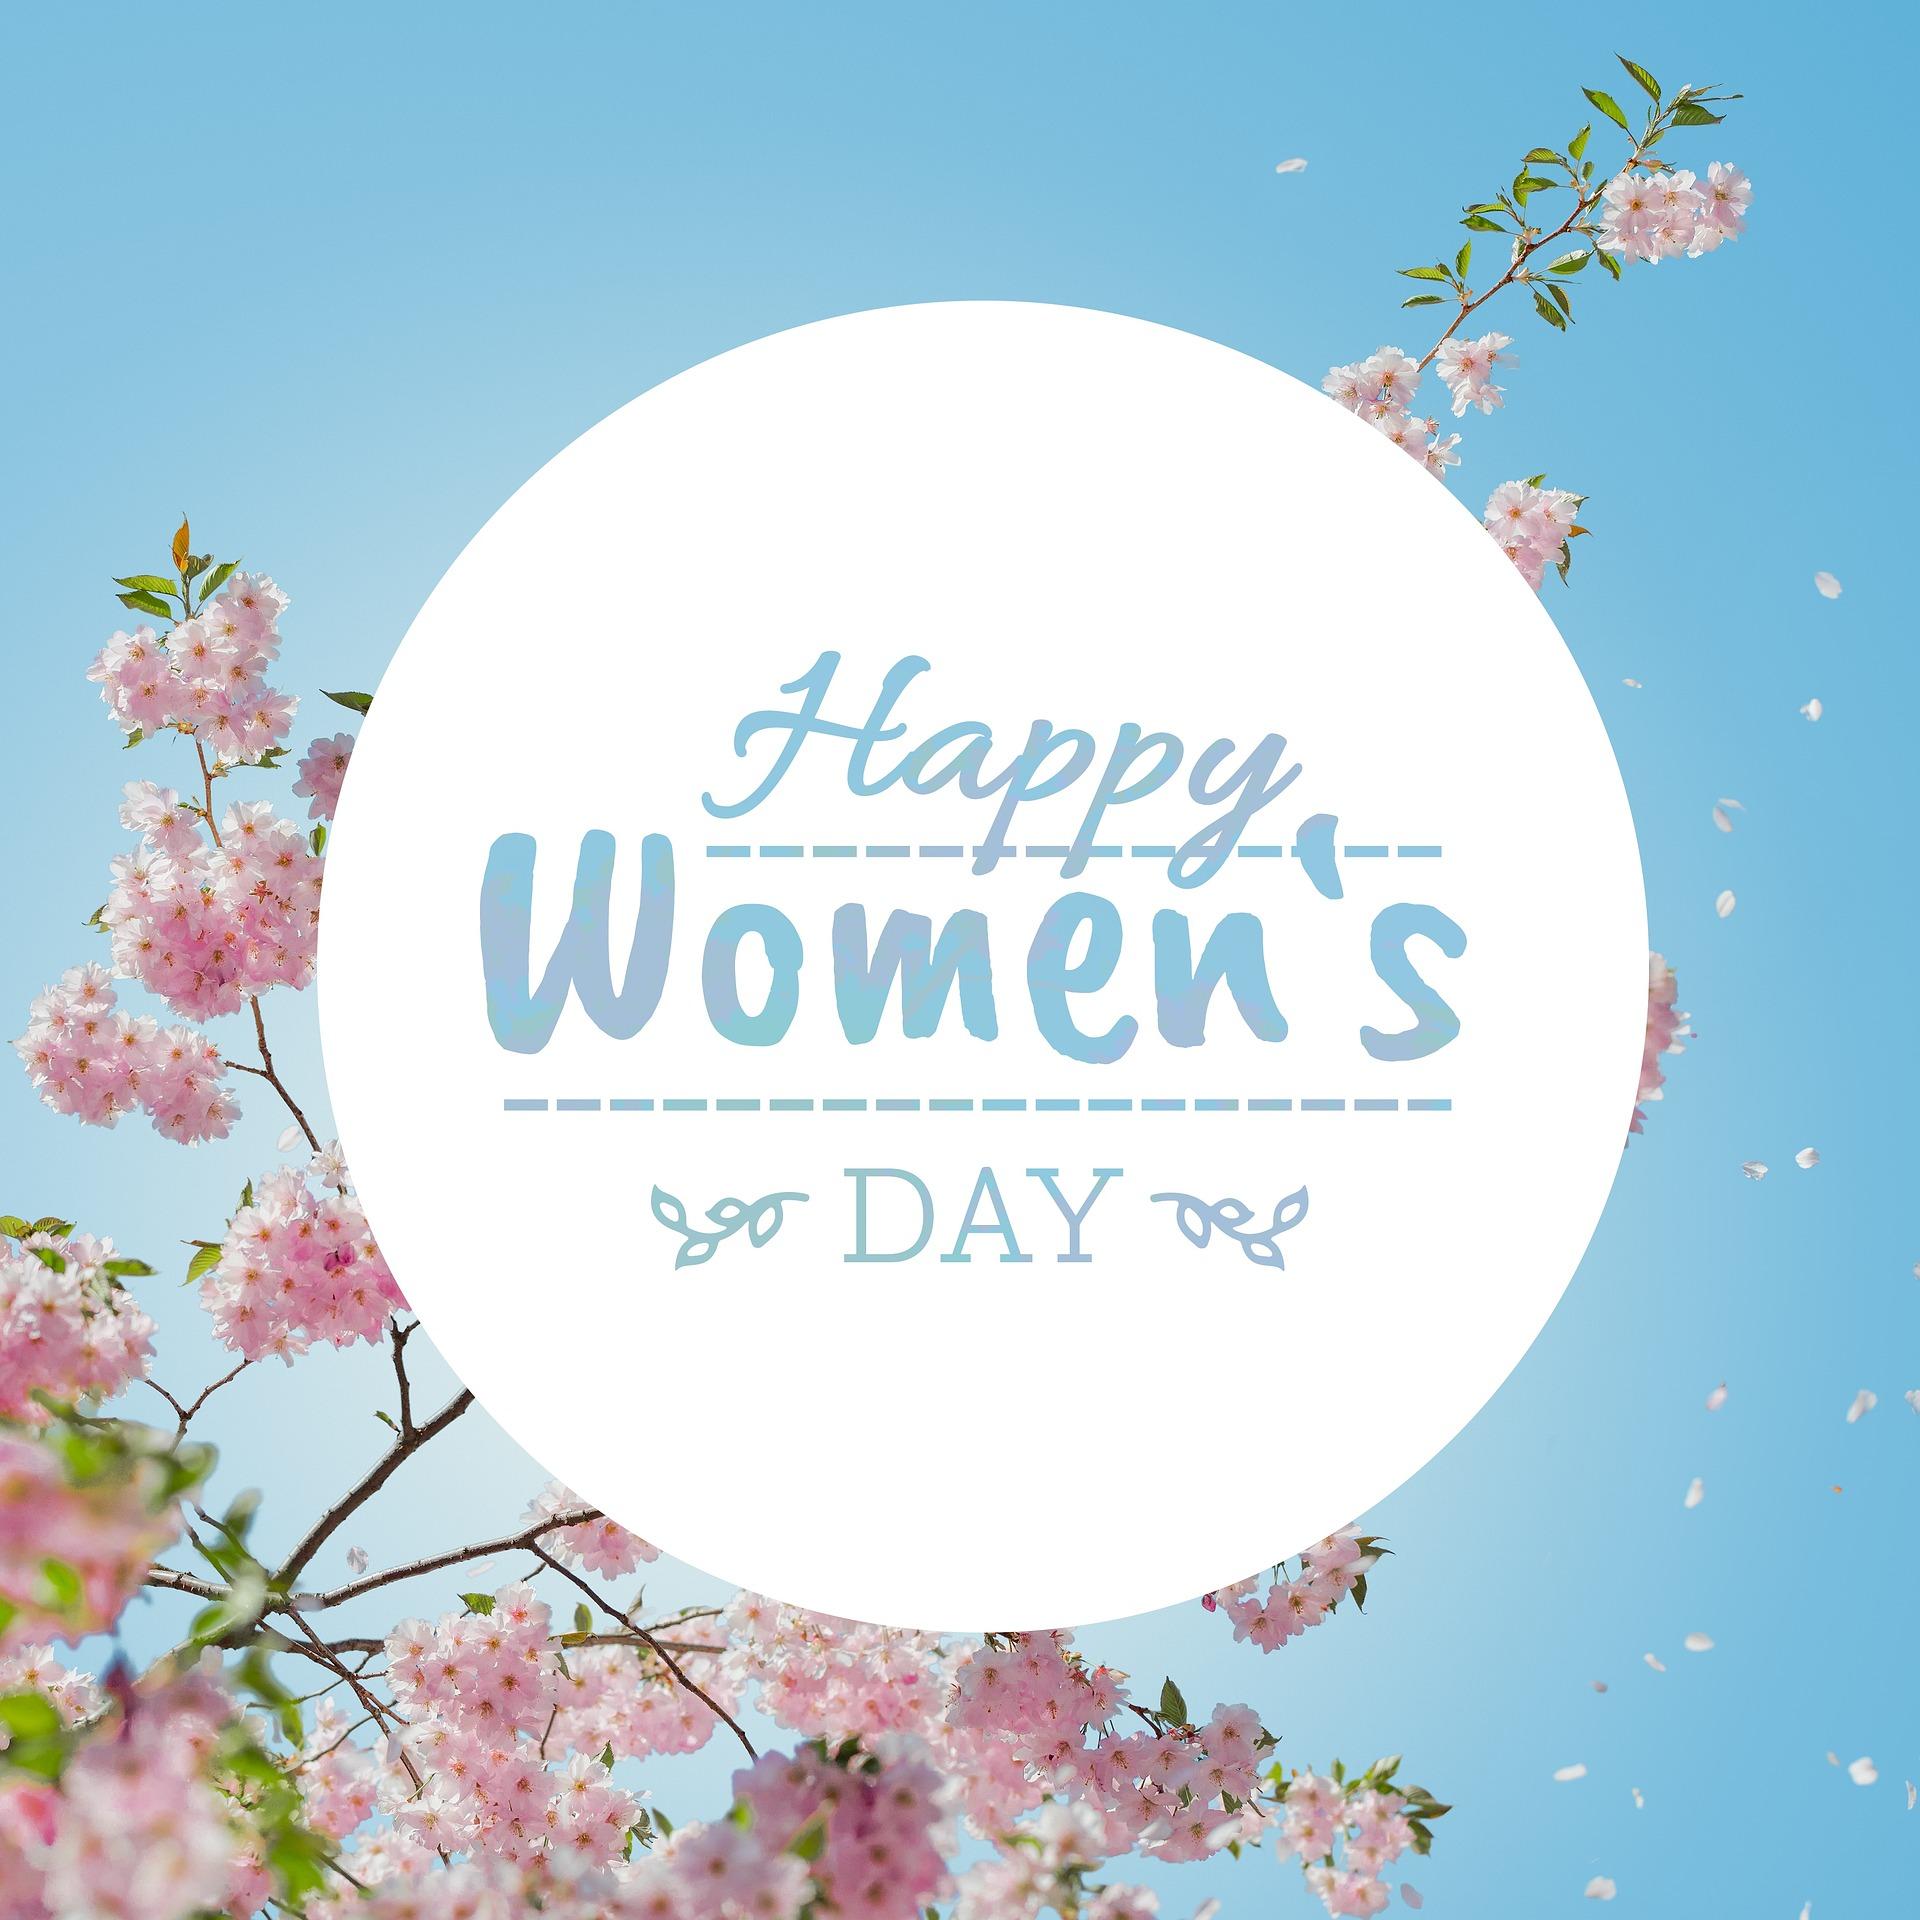 womens-day-3198007_1920.jpg